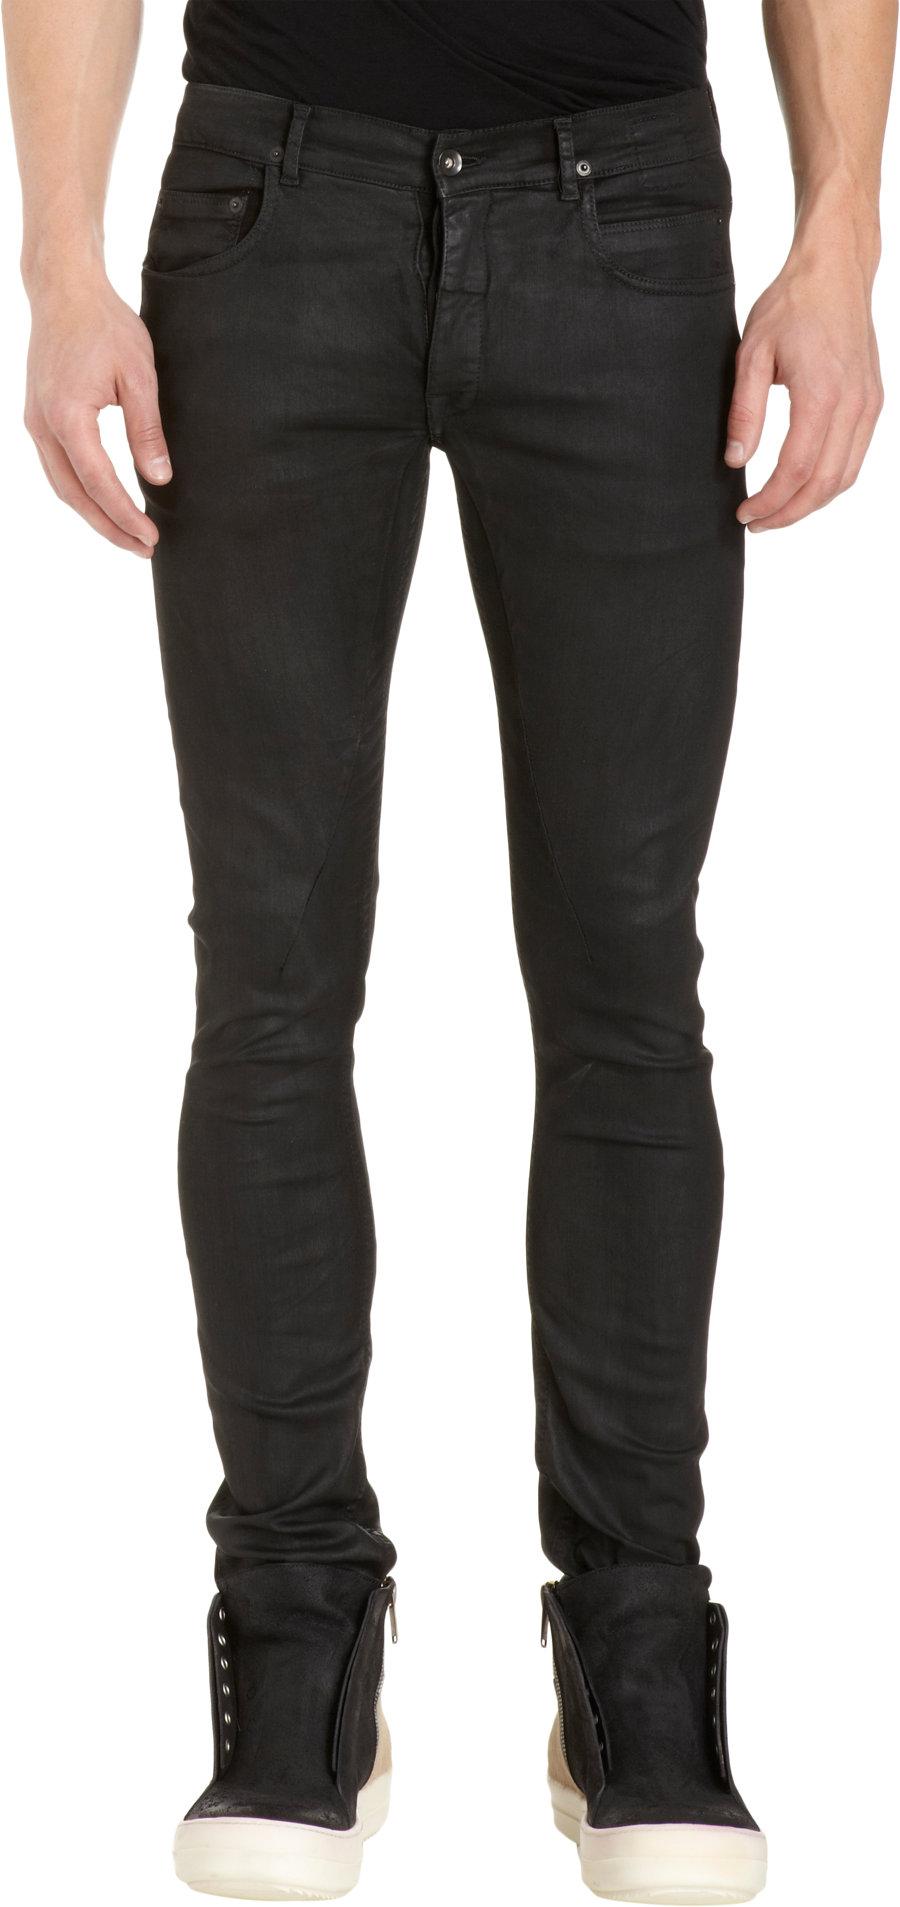 Rick Owens Drkshdw Waxed Detroit Cut Jeans In Black For